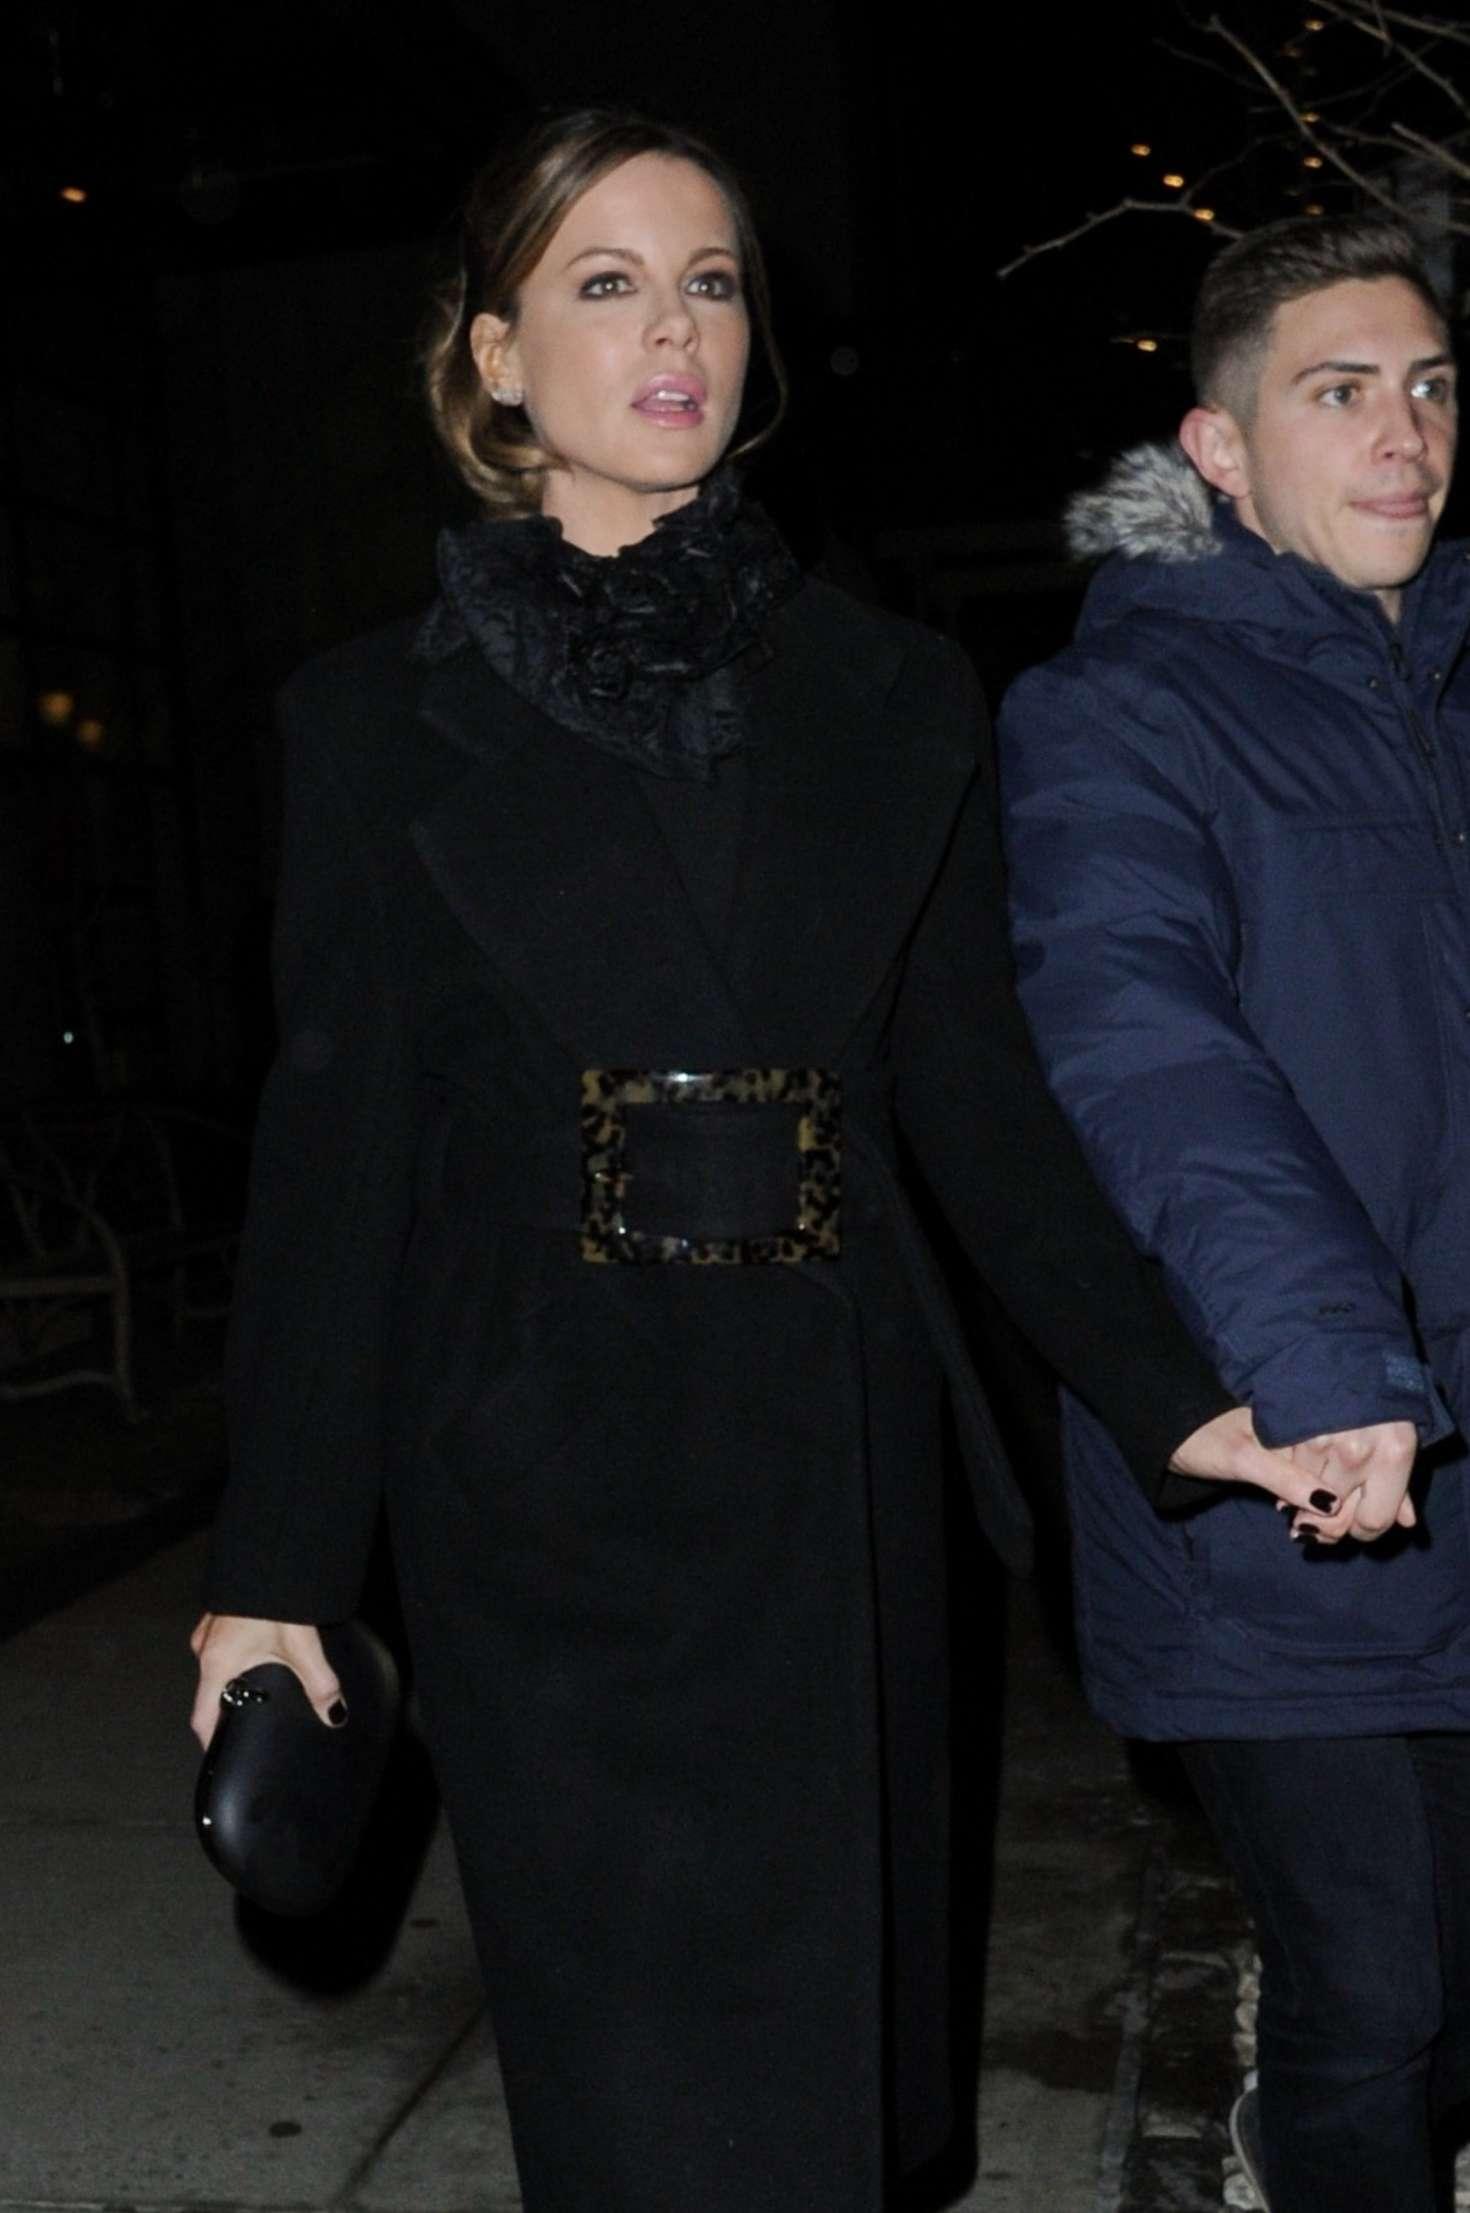 Kate Beckinsale - Outside DU JOUR Celebrates Cover star Kate Beckinsale in NYC